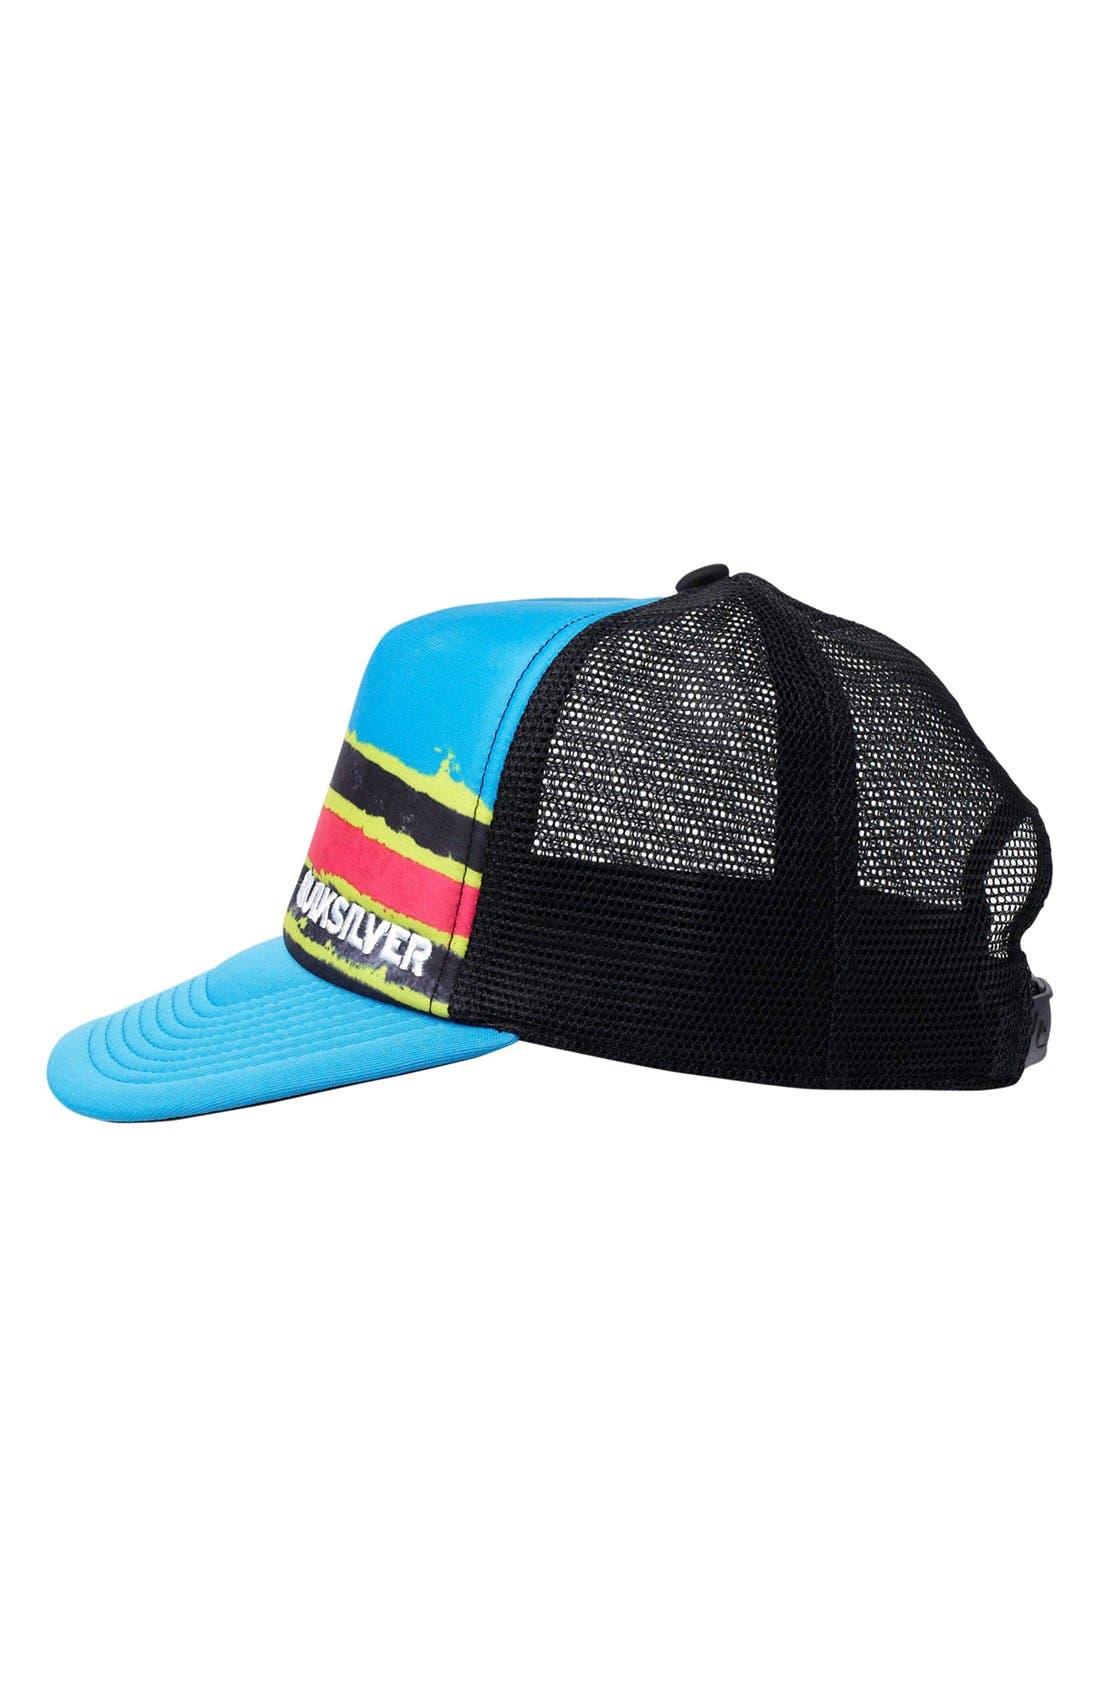 Alternate Image 2  - Quiksilver 'Boards' Trucker Hat (Toddler Boys)